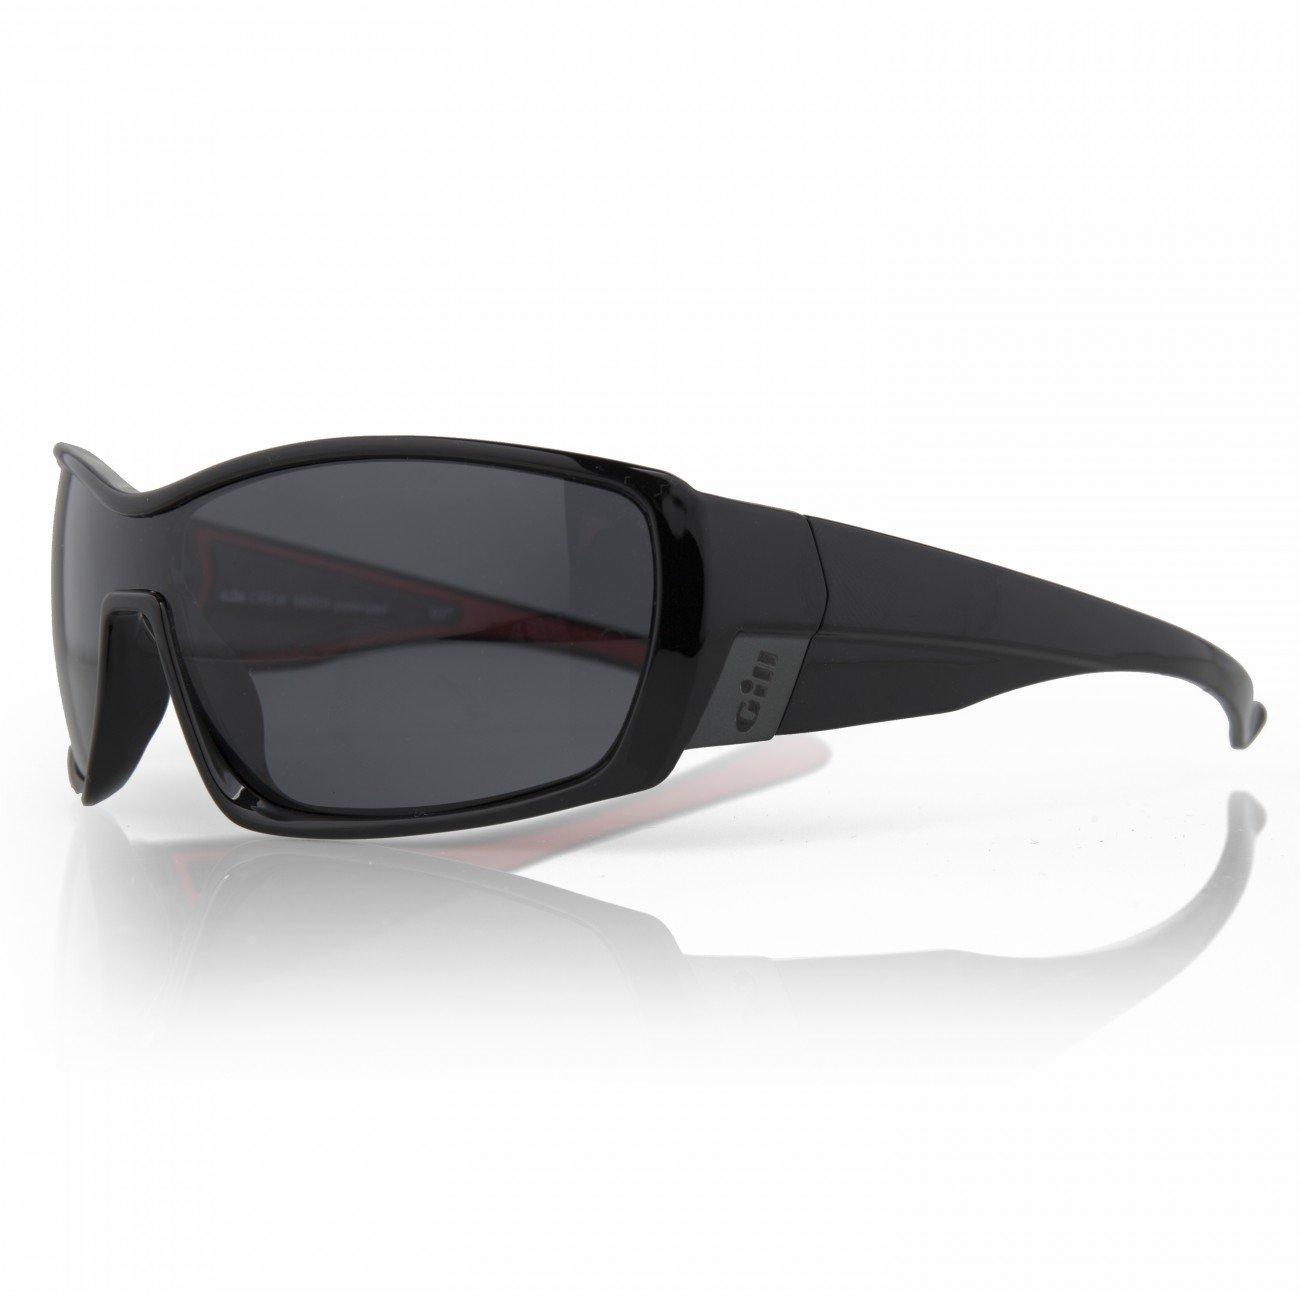 2016 Gill Crew Sunglasses Matt Black 9665 ZRu69r39ss